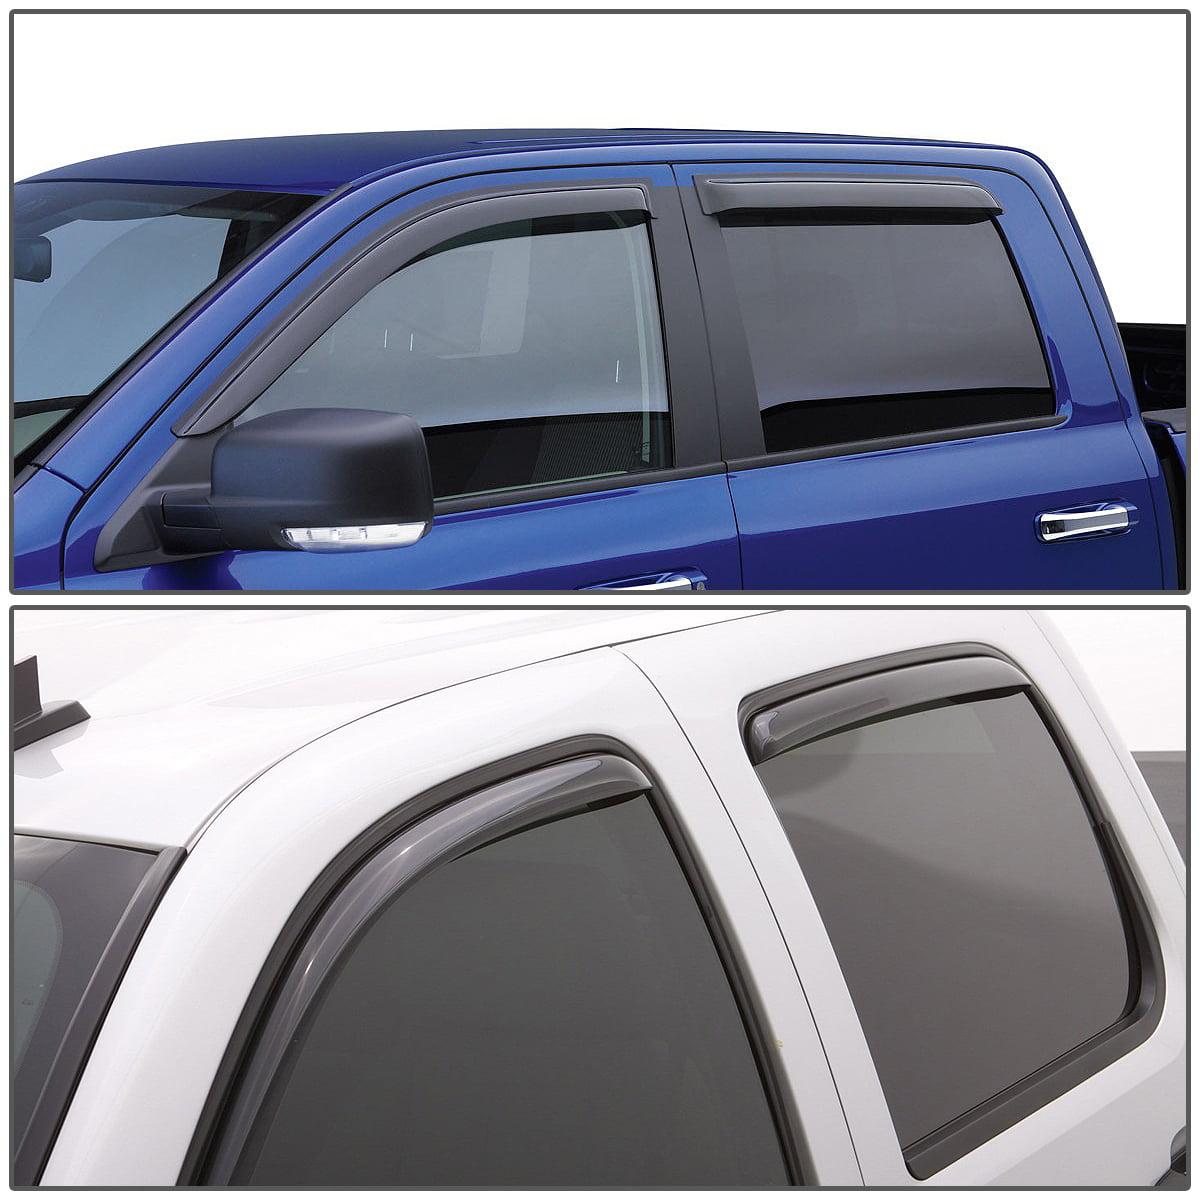 MGPRO 4pcs For 2004-2012 Colorado Crew Cab /& 2004-2012 GMC Canyon Crew Cab In-Channel Sun Rain Guard Vent Shade Side Window Wind Deflectors Window Visors